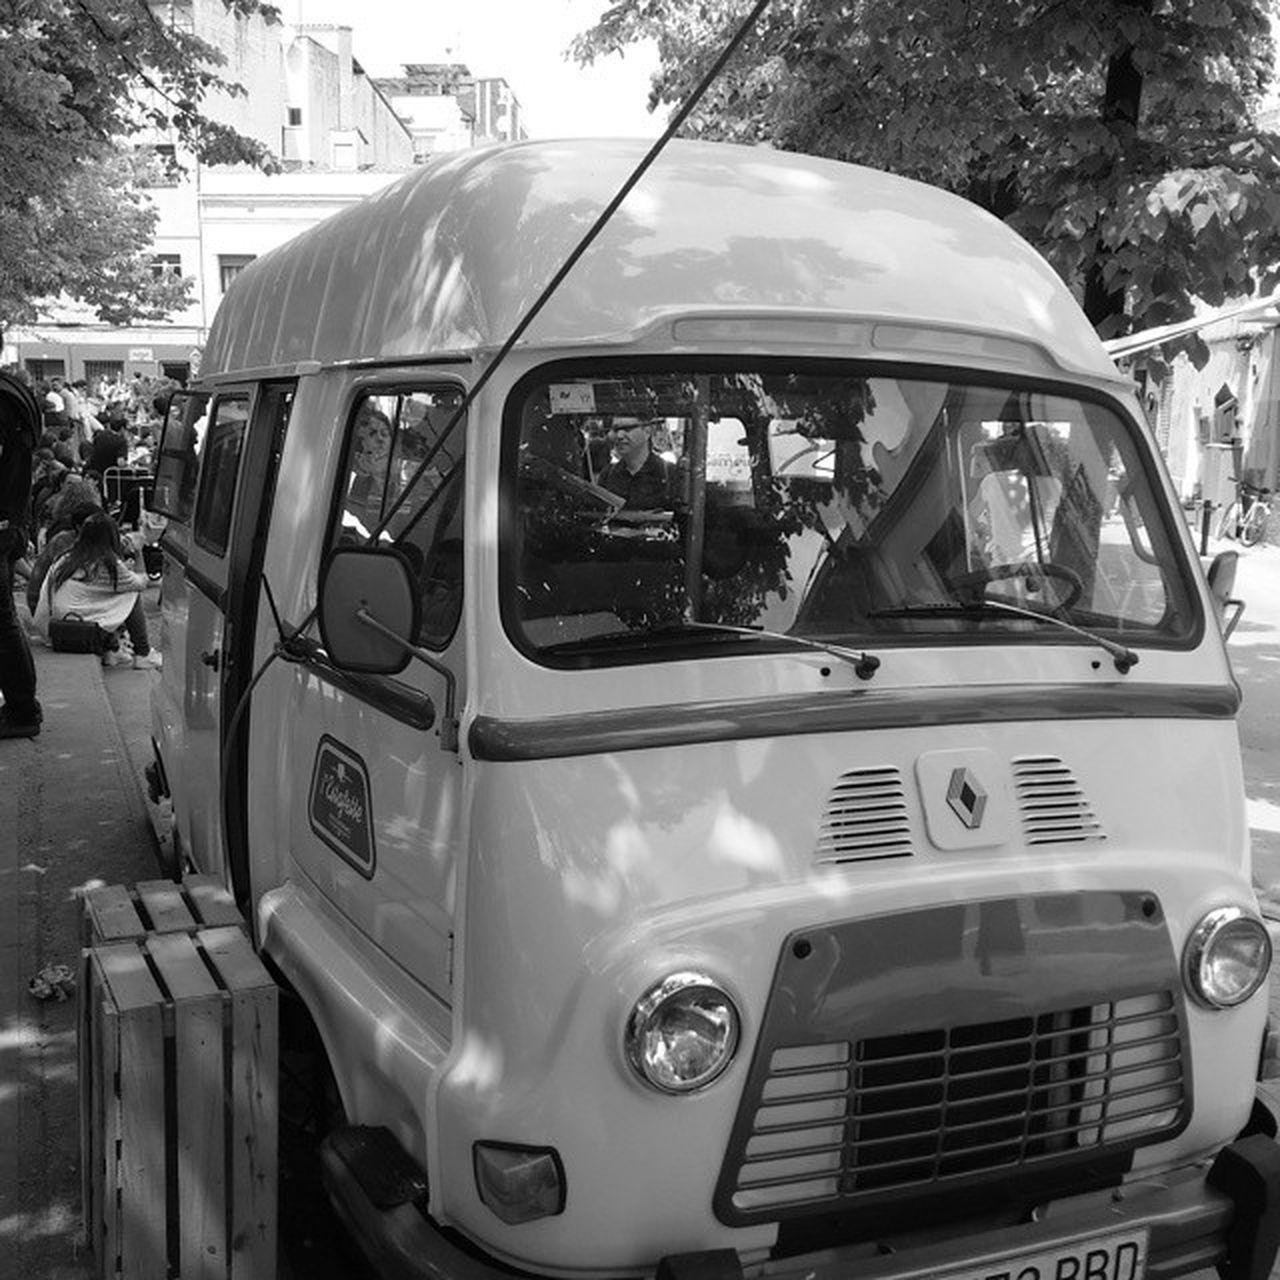 The old van Old Oldvan Van Blackandwhite Blancinegre Blancoynegro Blancetnoir Bn Stcugatexperience Santcugat Catalonia Catalunya